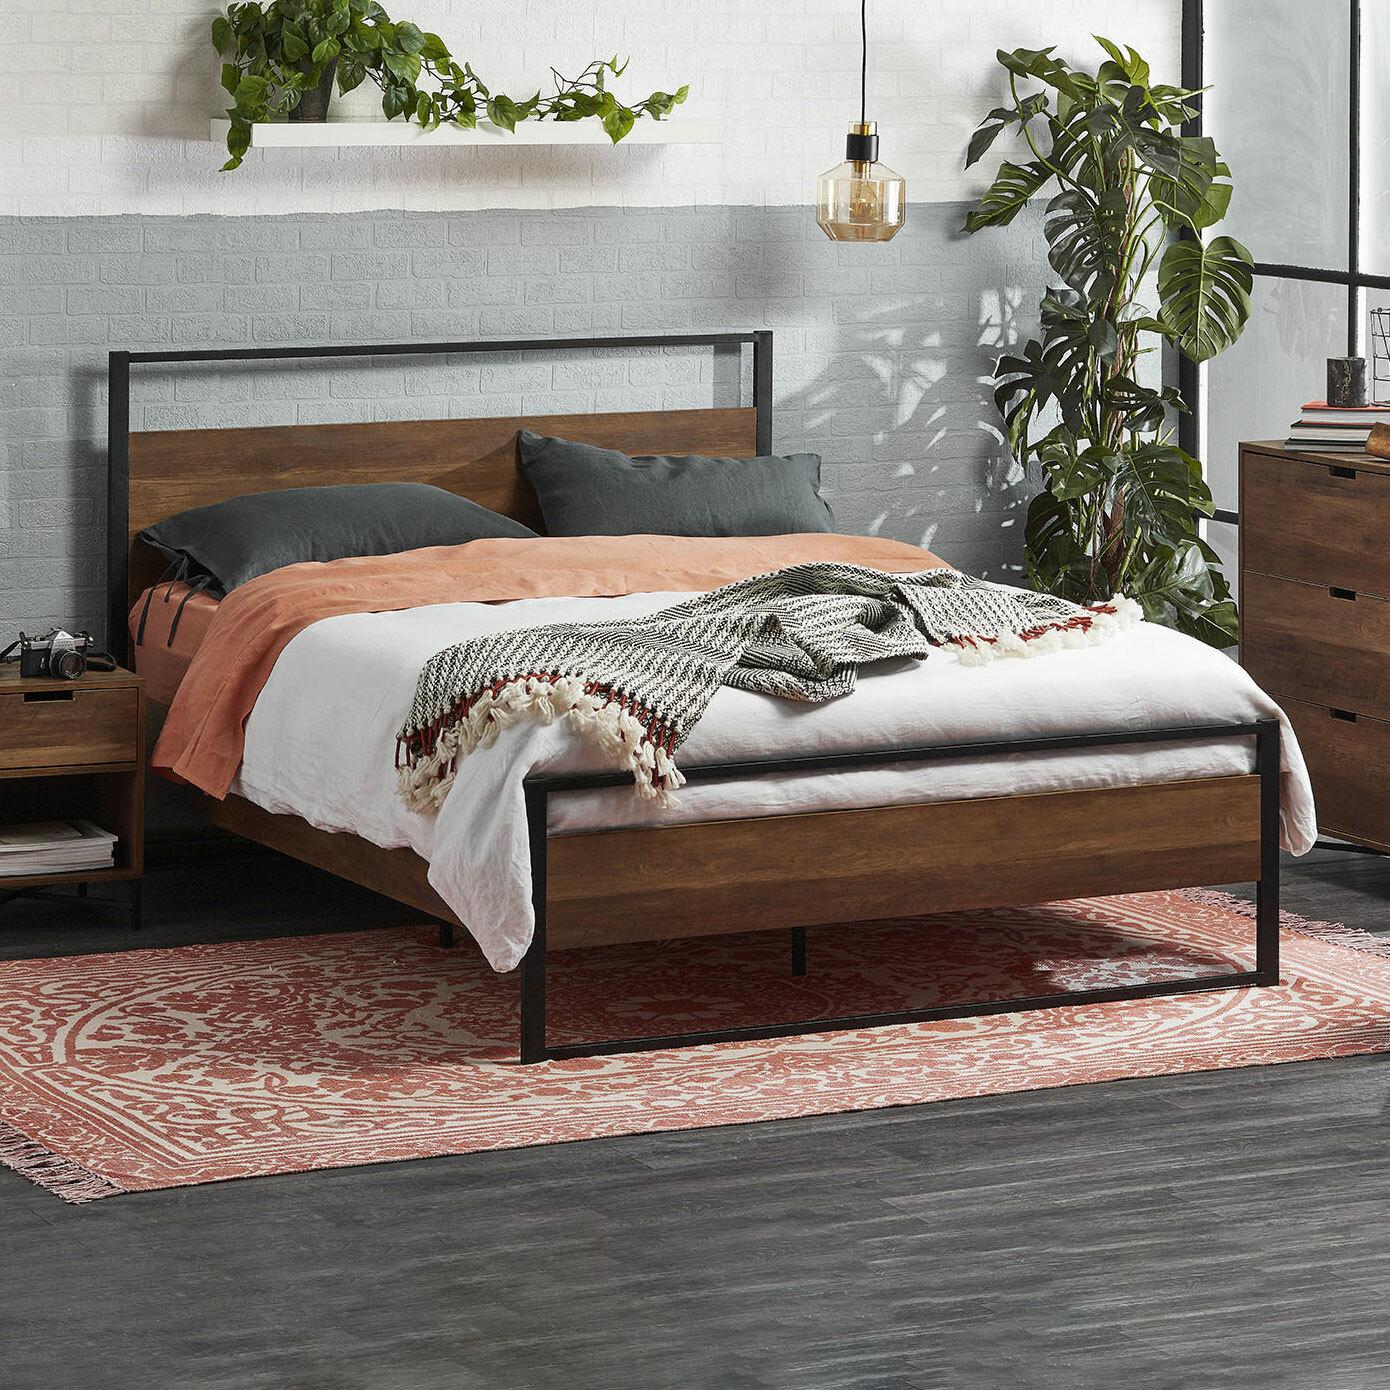 Kodu Industrial Austin Queen Bed Frame Temple Webster